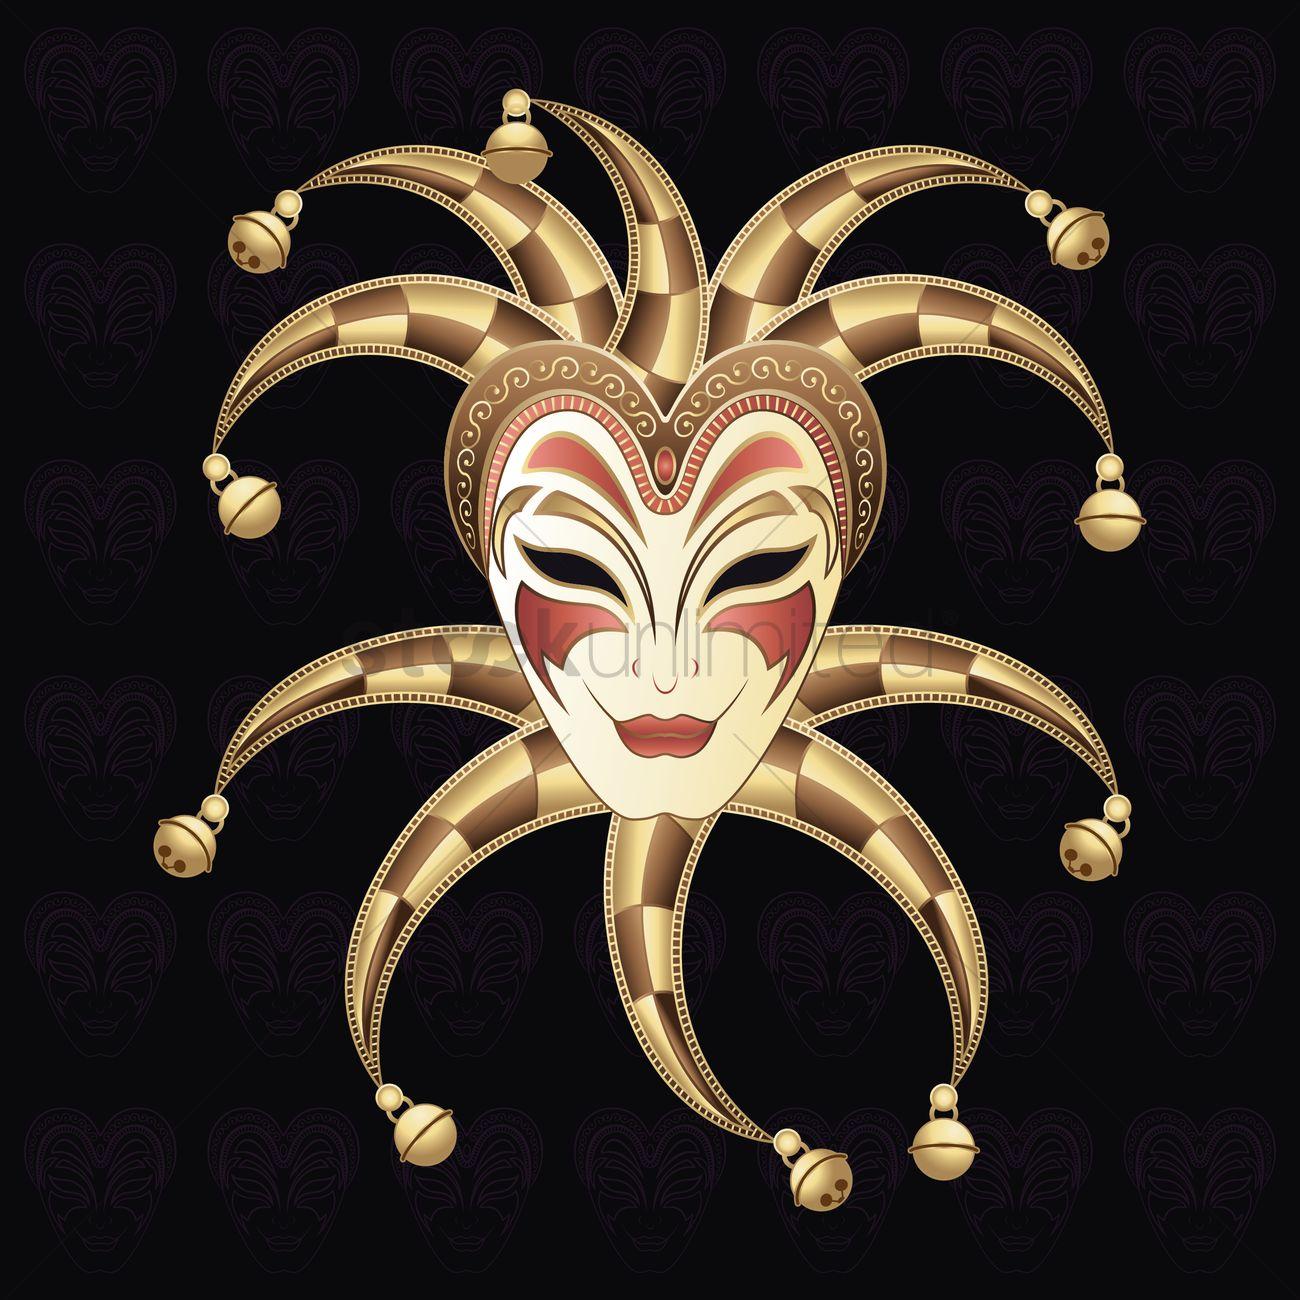 Venetian jester mask Vector Image - 1508830 | StockUnlimited